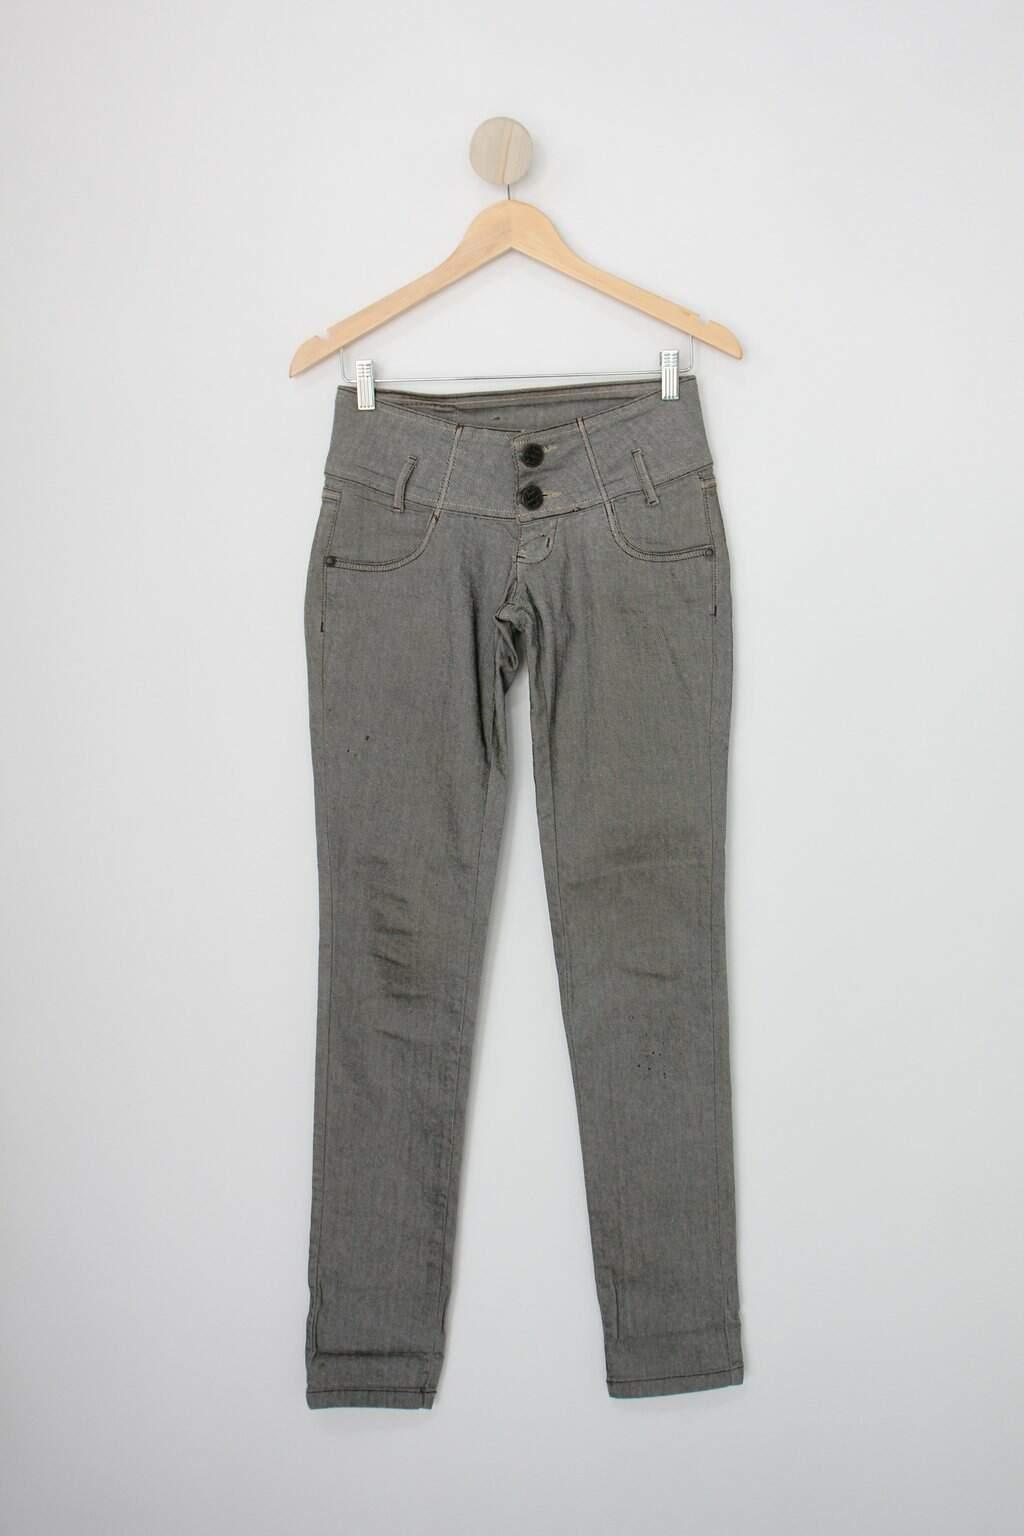 Calça Jeans Jeans.com Feminina Cinza